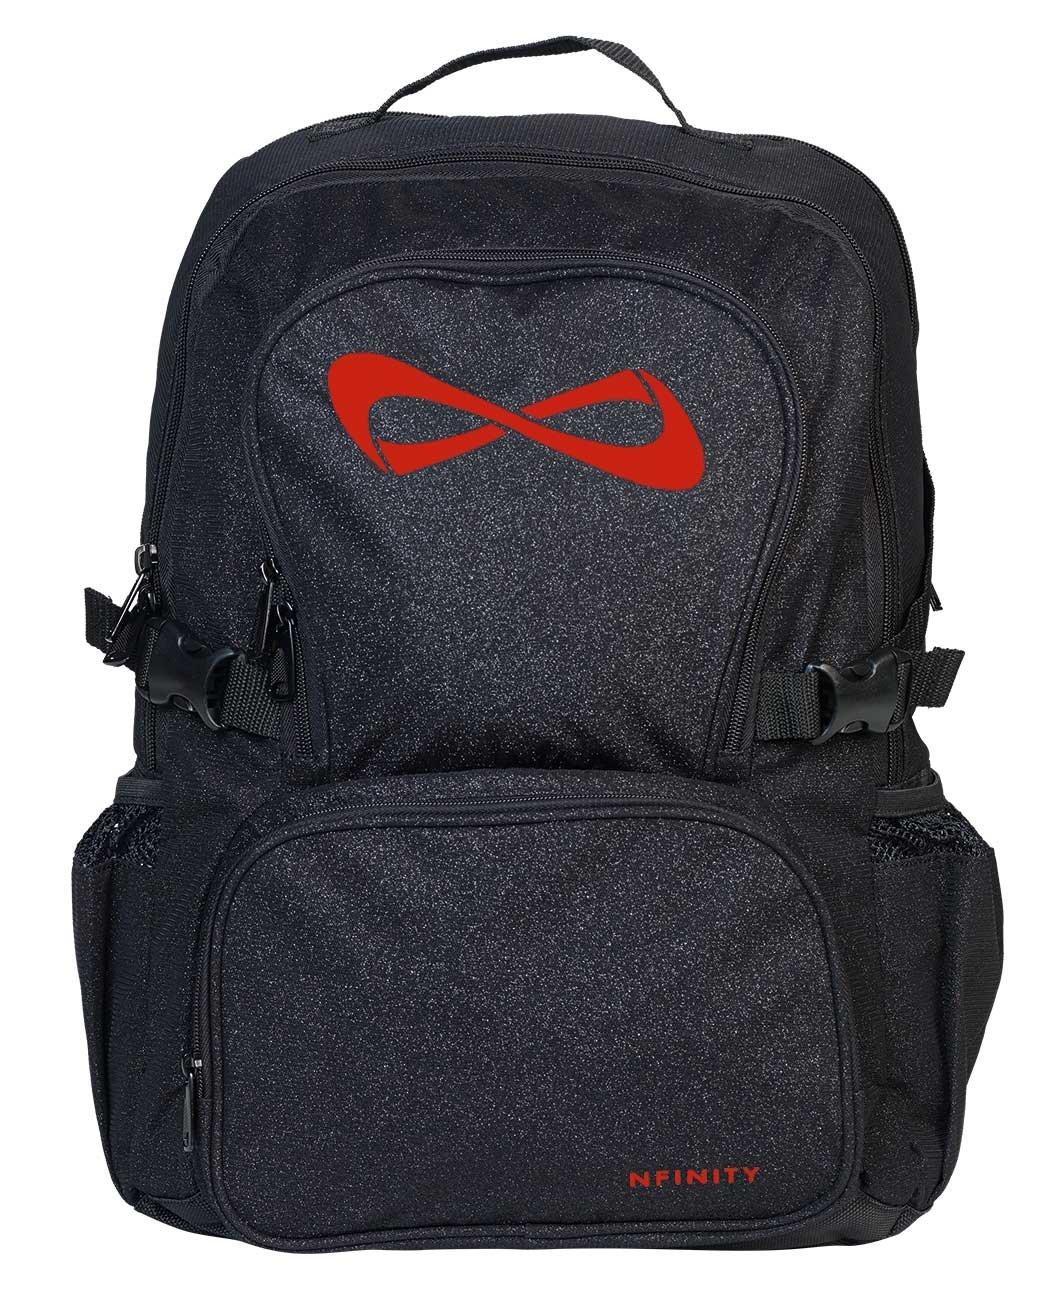 Nfinity Sac à dos Sparkle Black/Red Eric McCrite Company NF-9008-8102